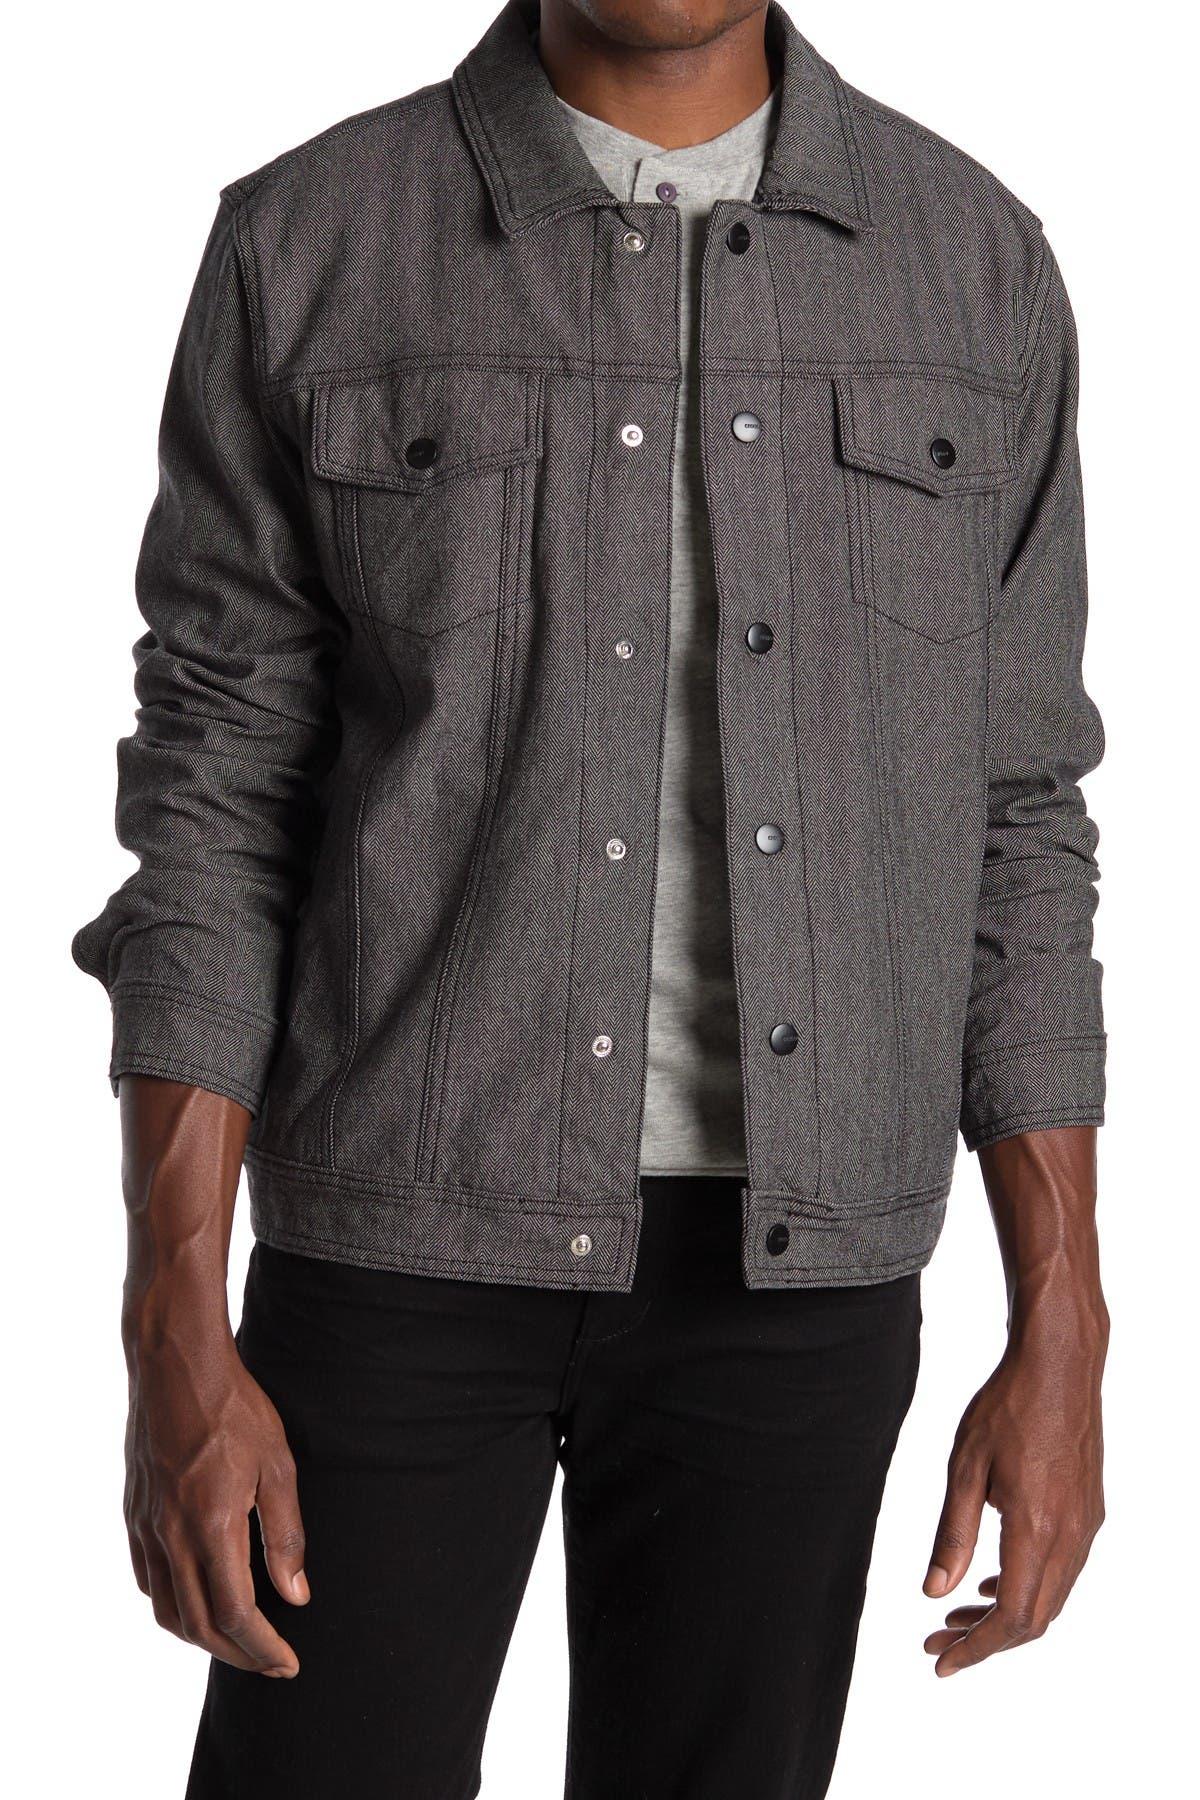 Image of Ezekiel Now Denim Herringbone Jacket